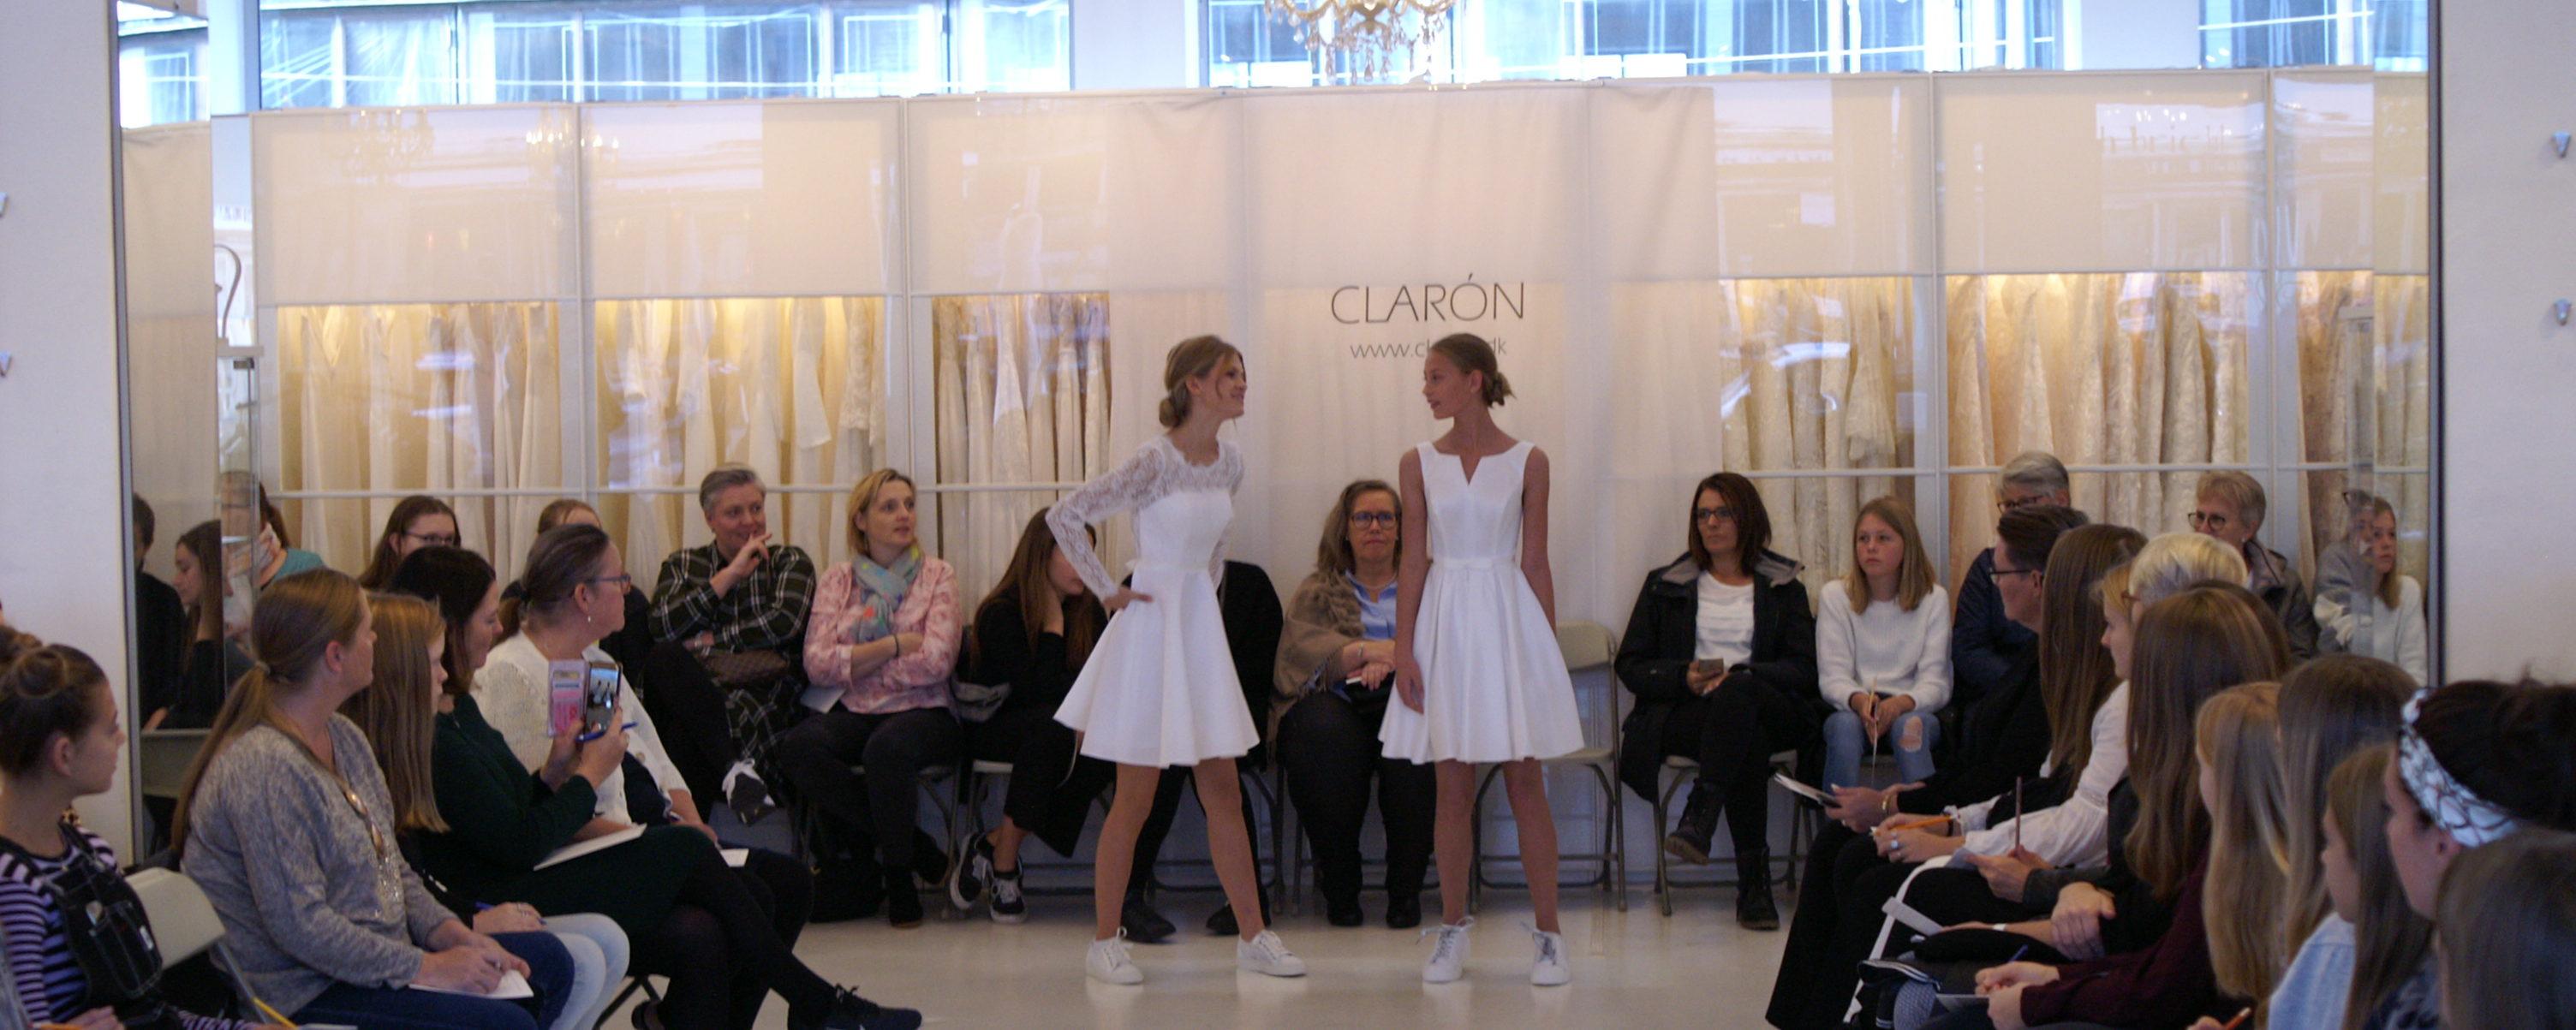 Modeshow konfirmationskjoler 2020